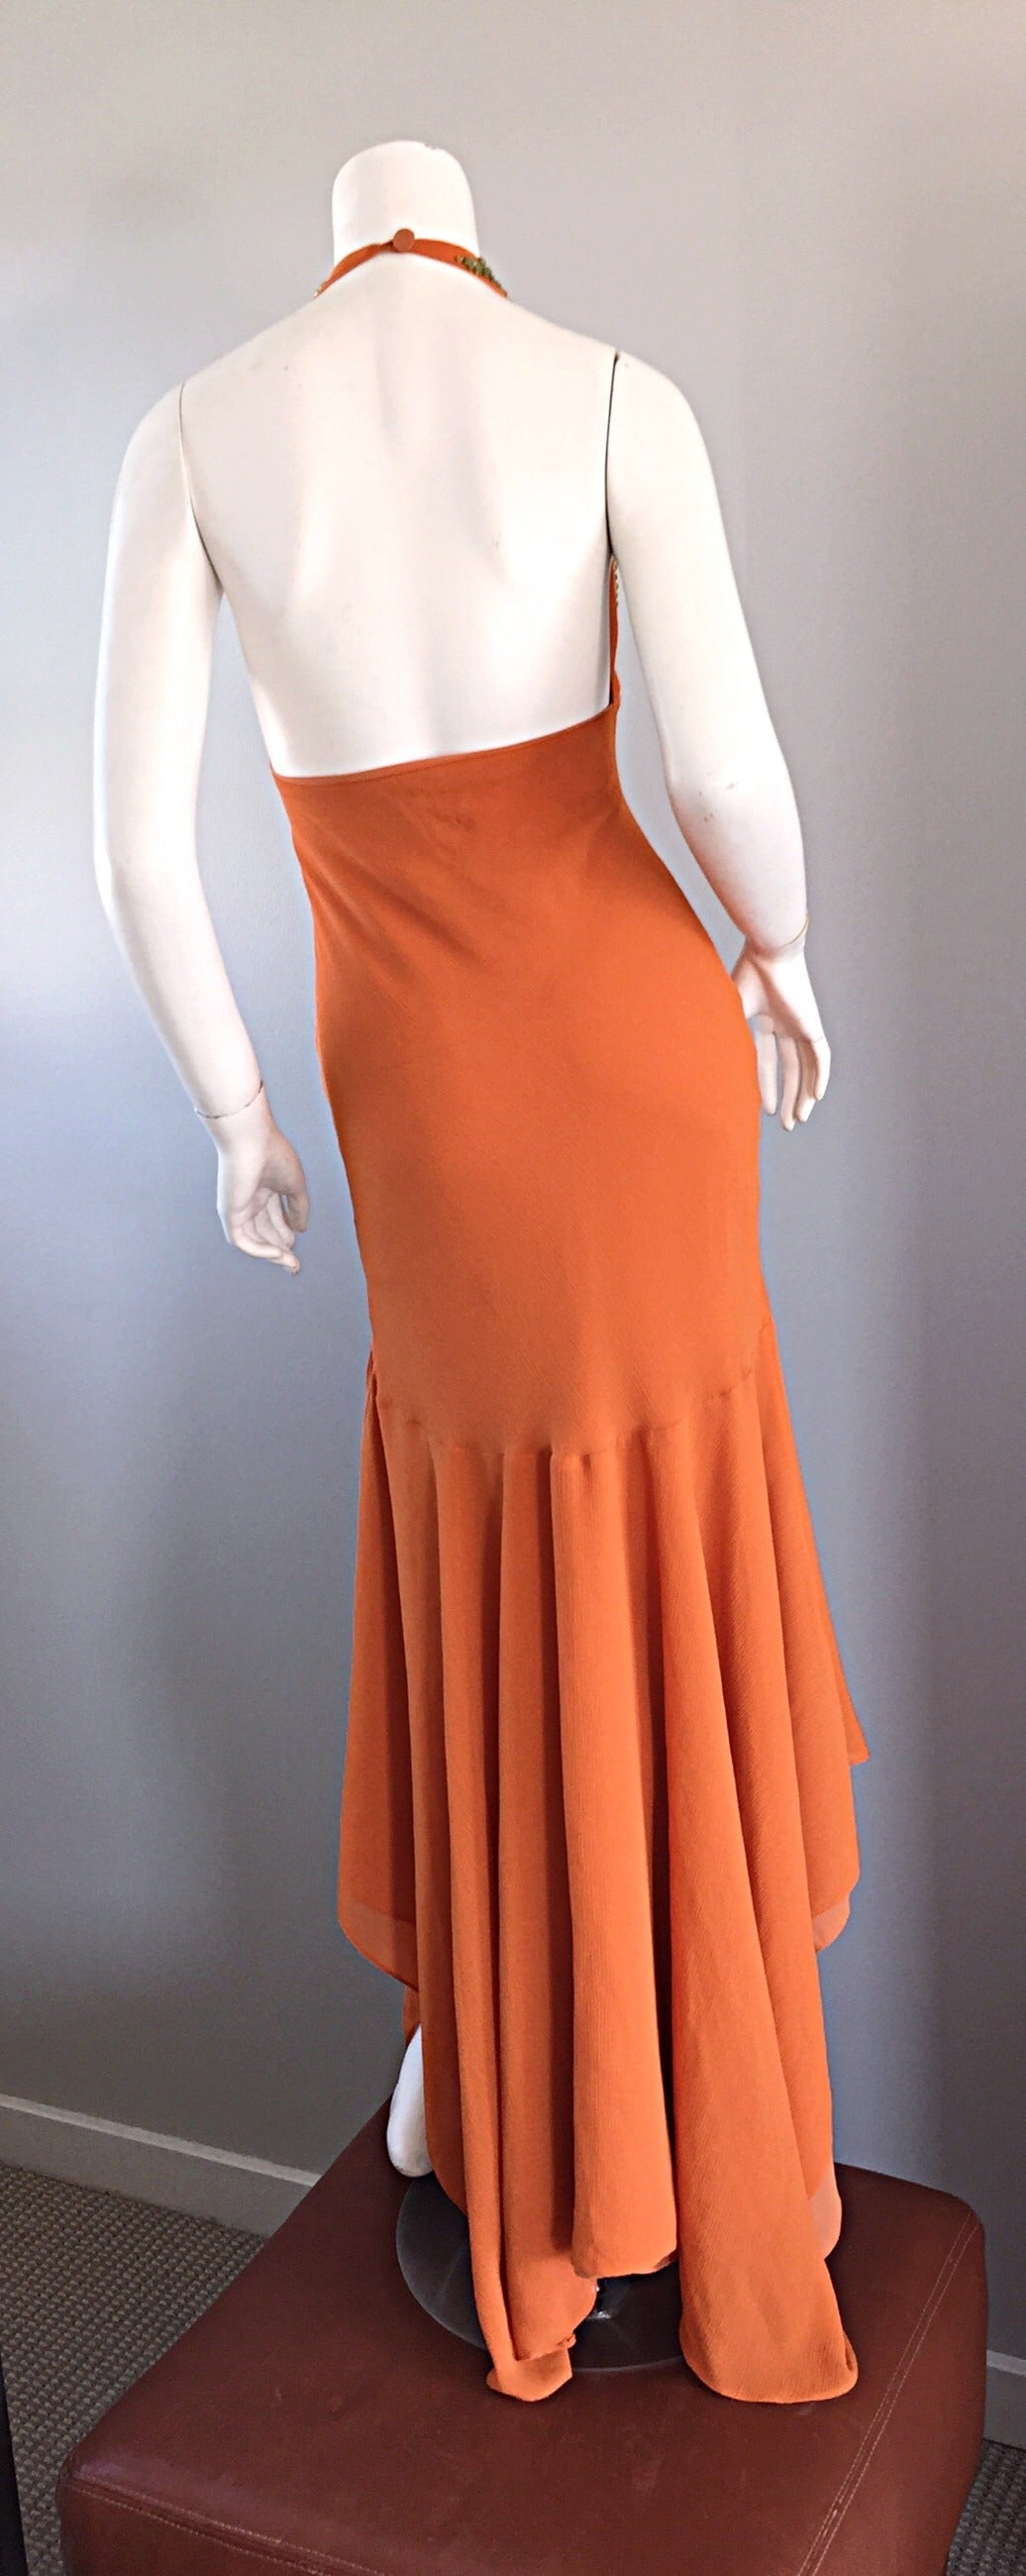 Sexy 1990s Silk Crepe Orange Mermaid Gown 90s Vintage Maxi Dress Vibrant Beading For Sale 2